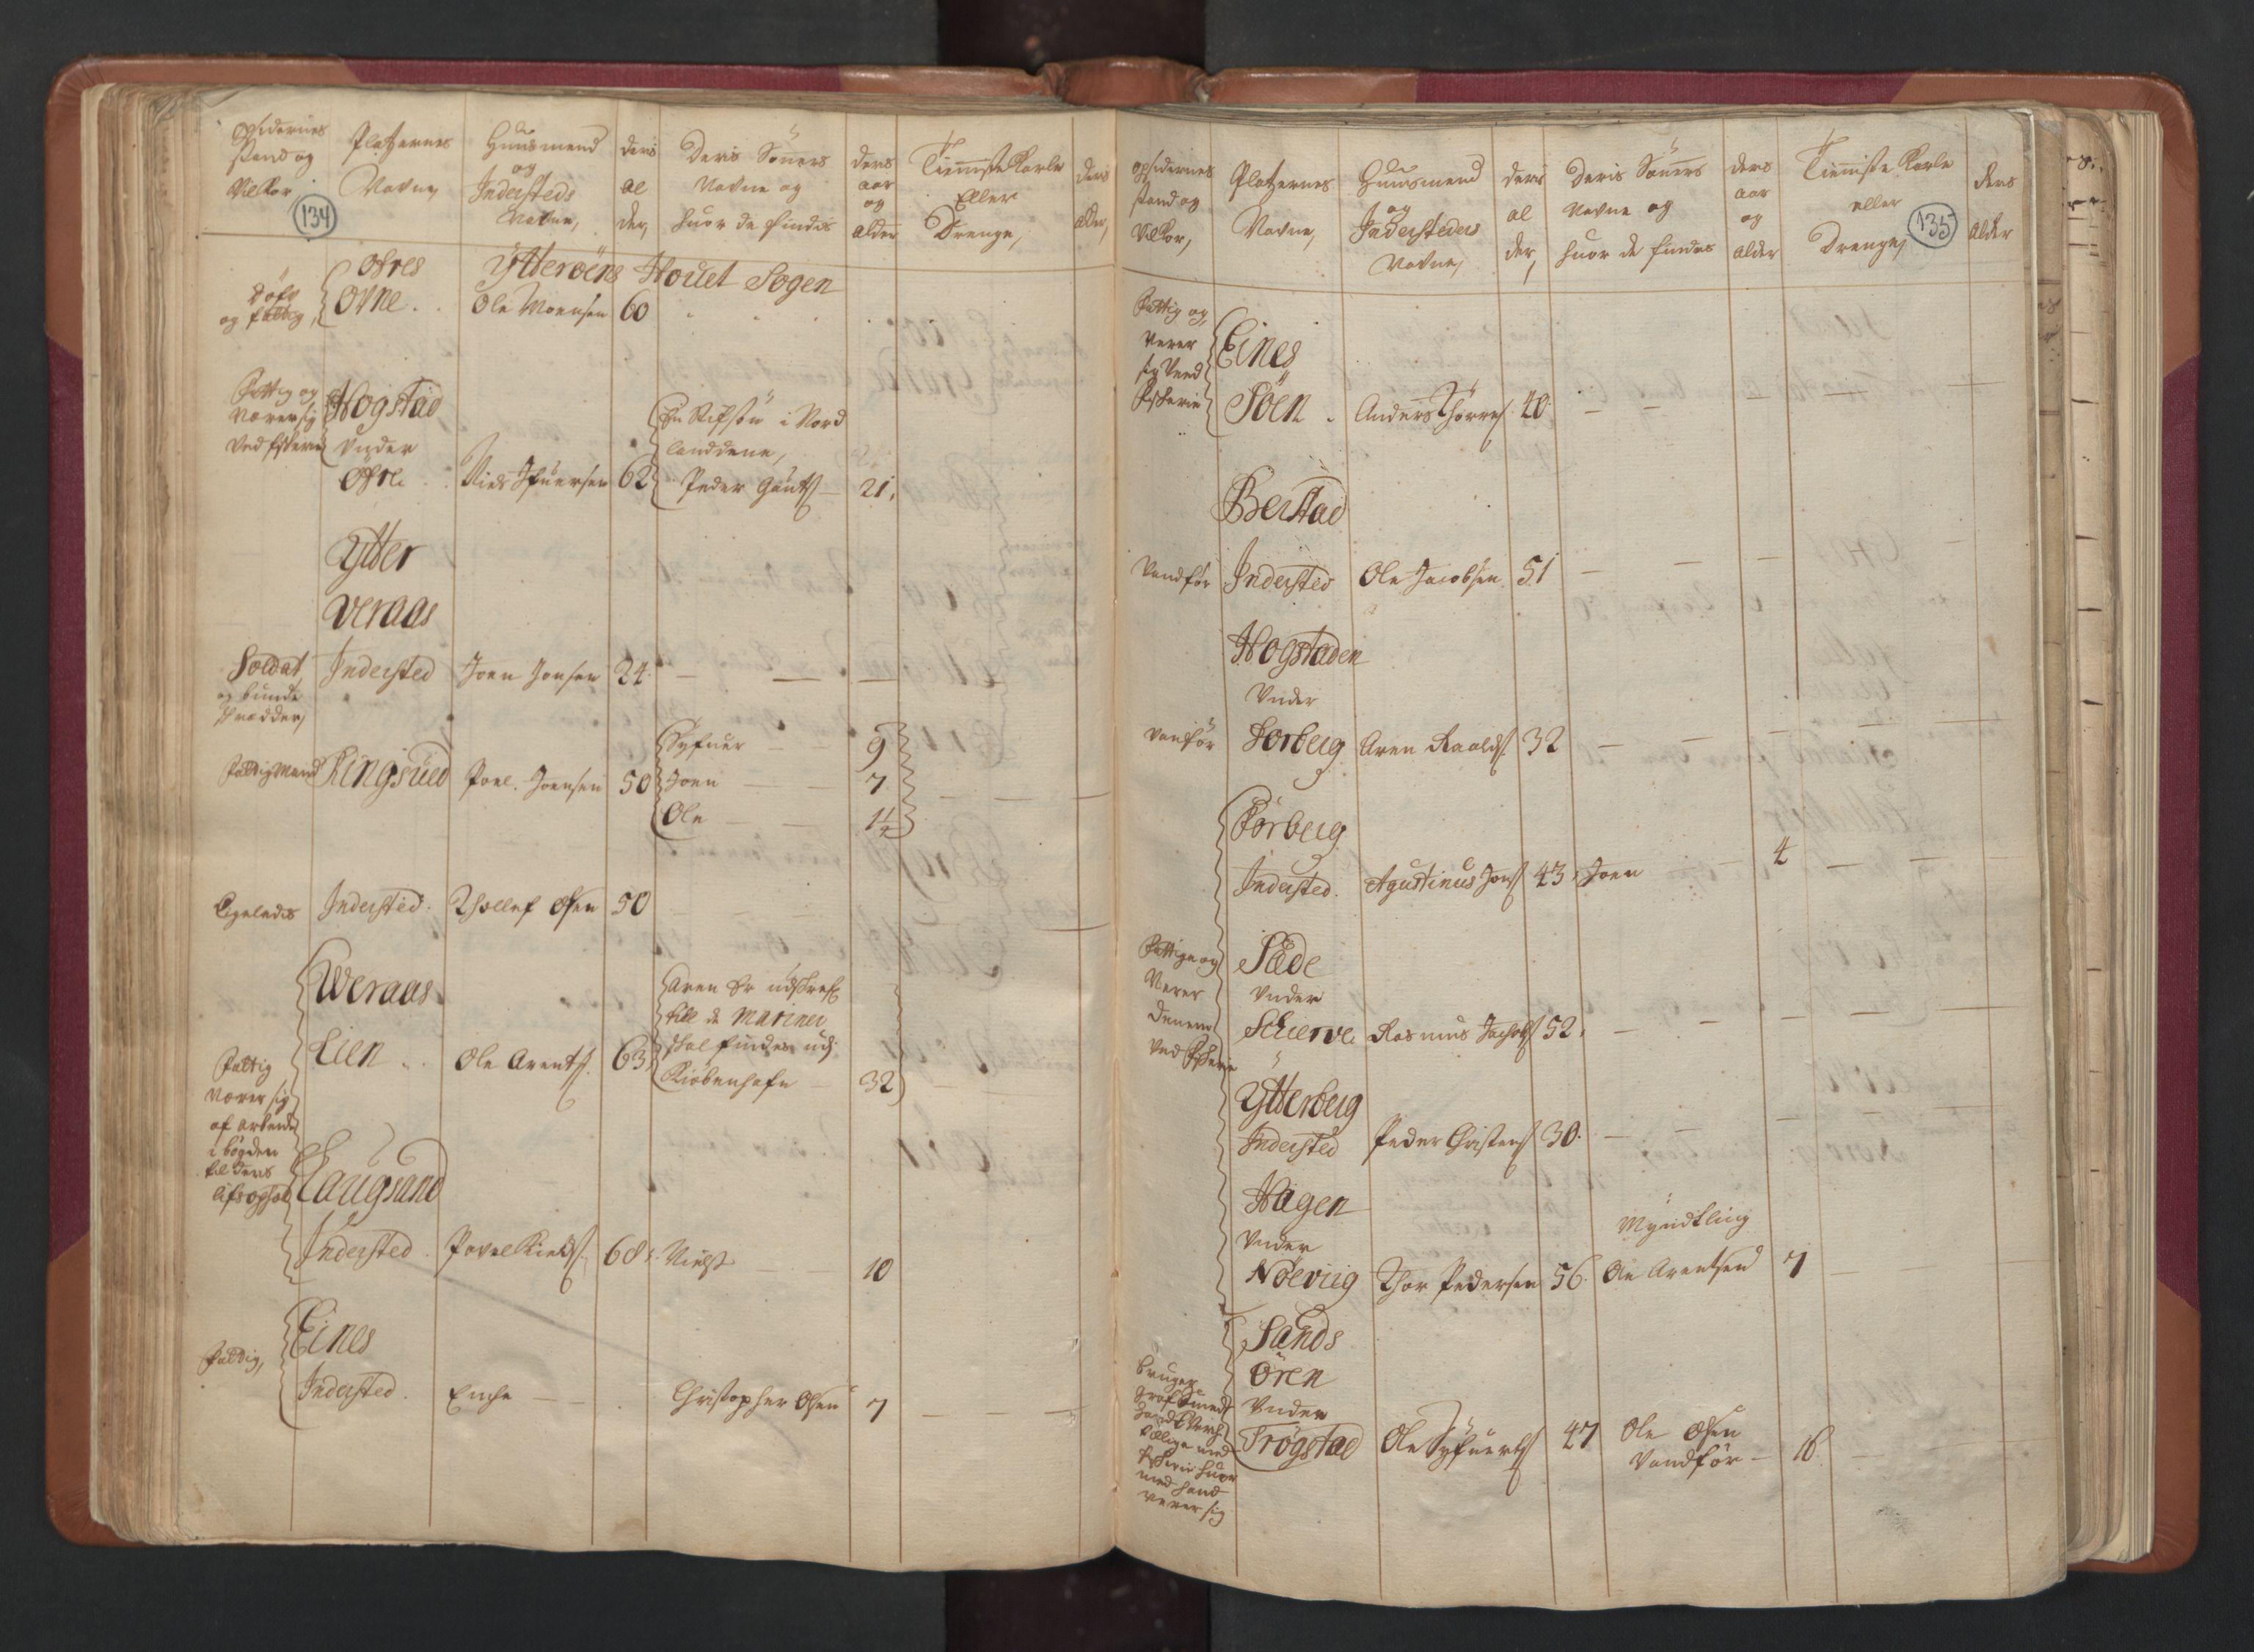 RA, Manntallet 1701, nr. 15: Inderøy fogderi og Namdal fogderi, 1701, s. 134-135